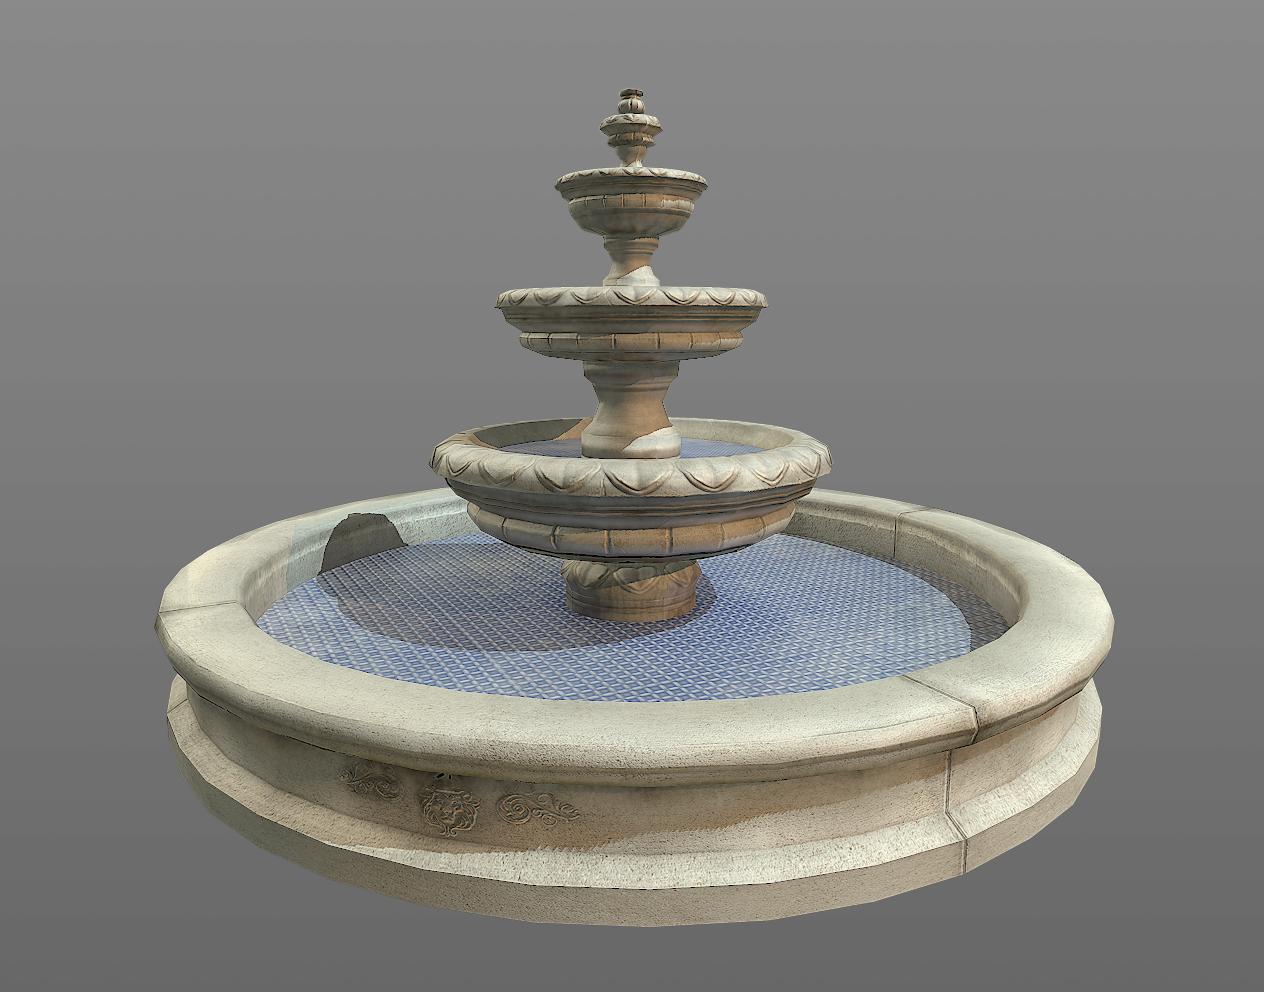 fountain_present1.jpg